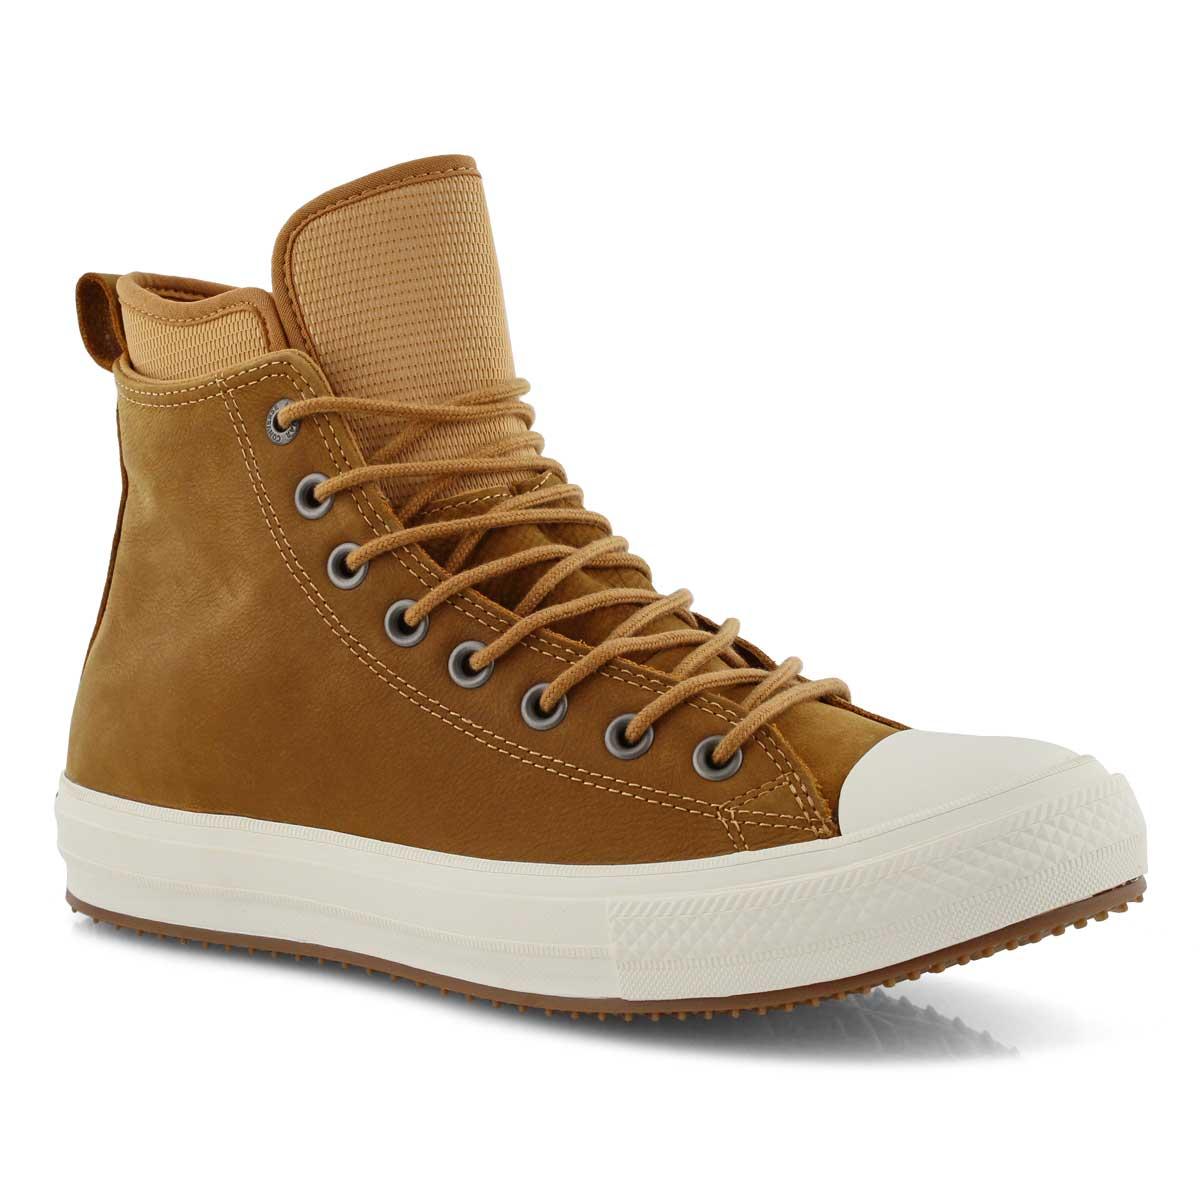 Mns CTAS Waterproof Hi raw sugar boot